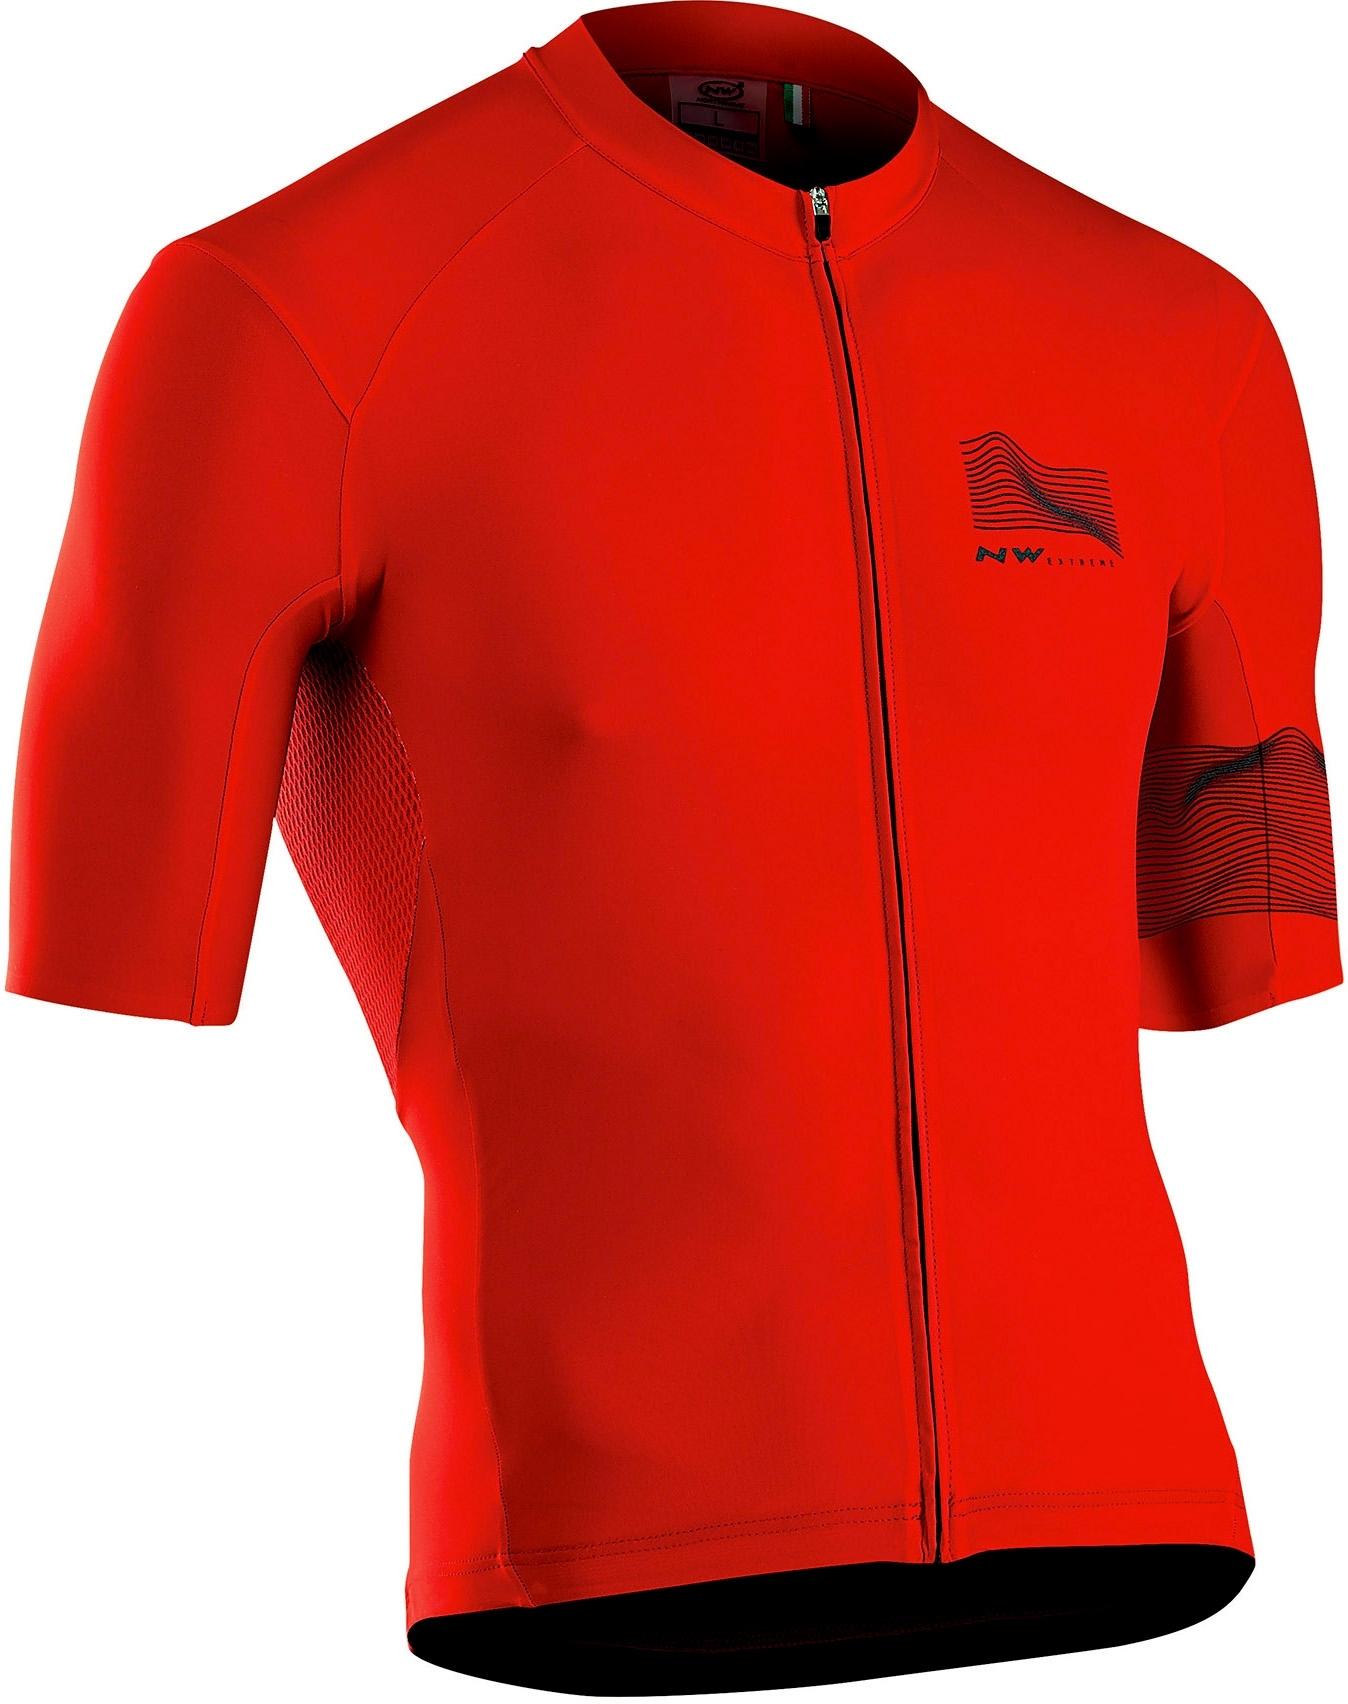 NORTHWAVE Man bike jersey short sleeves EXTREME 3 red